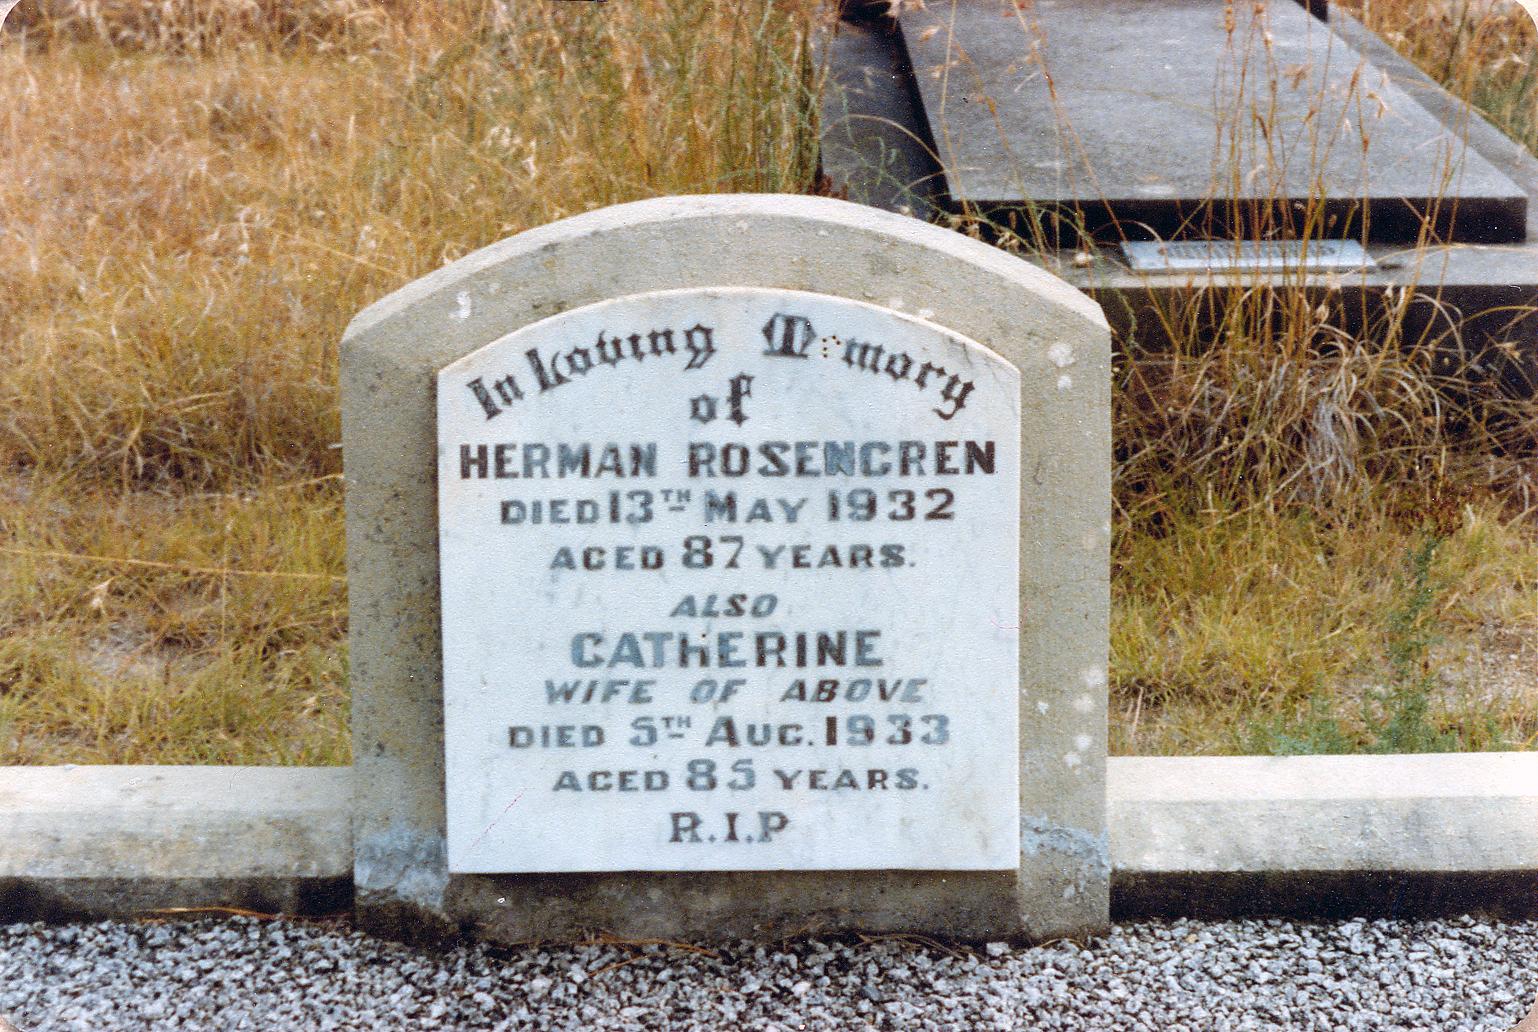 Catherine McAuliffe